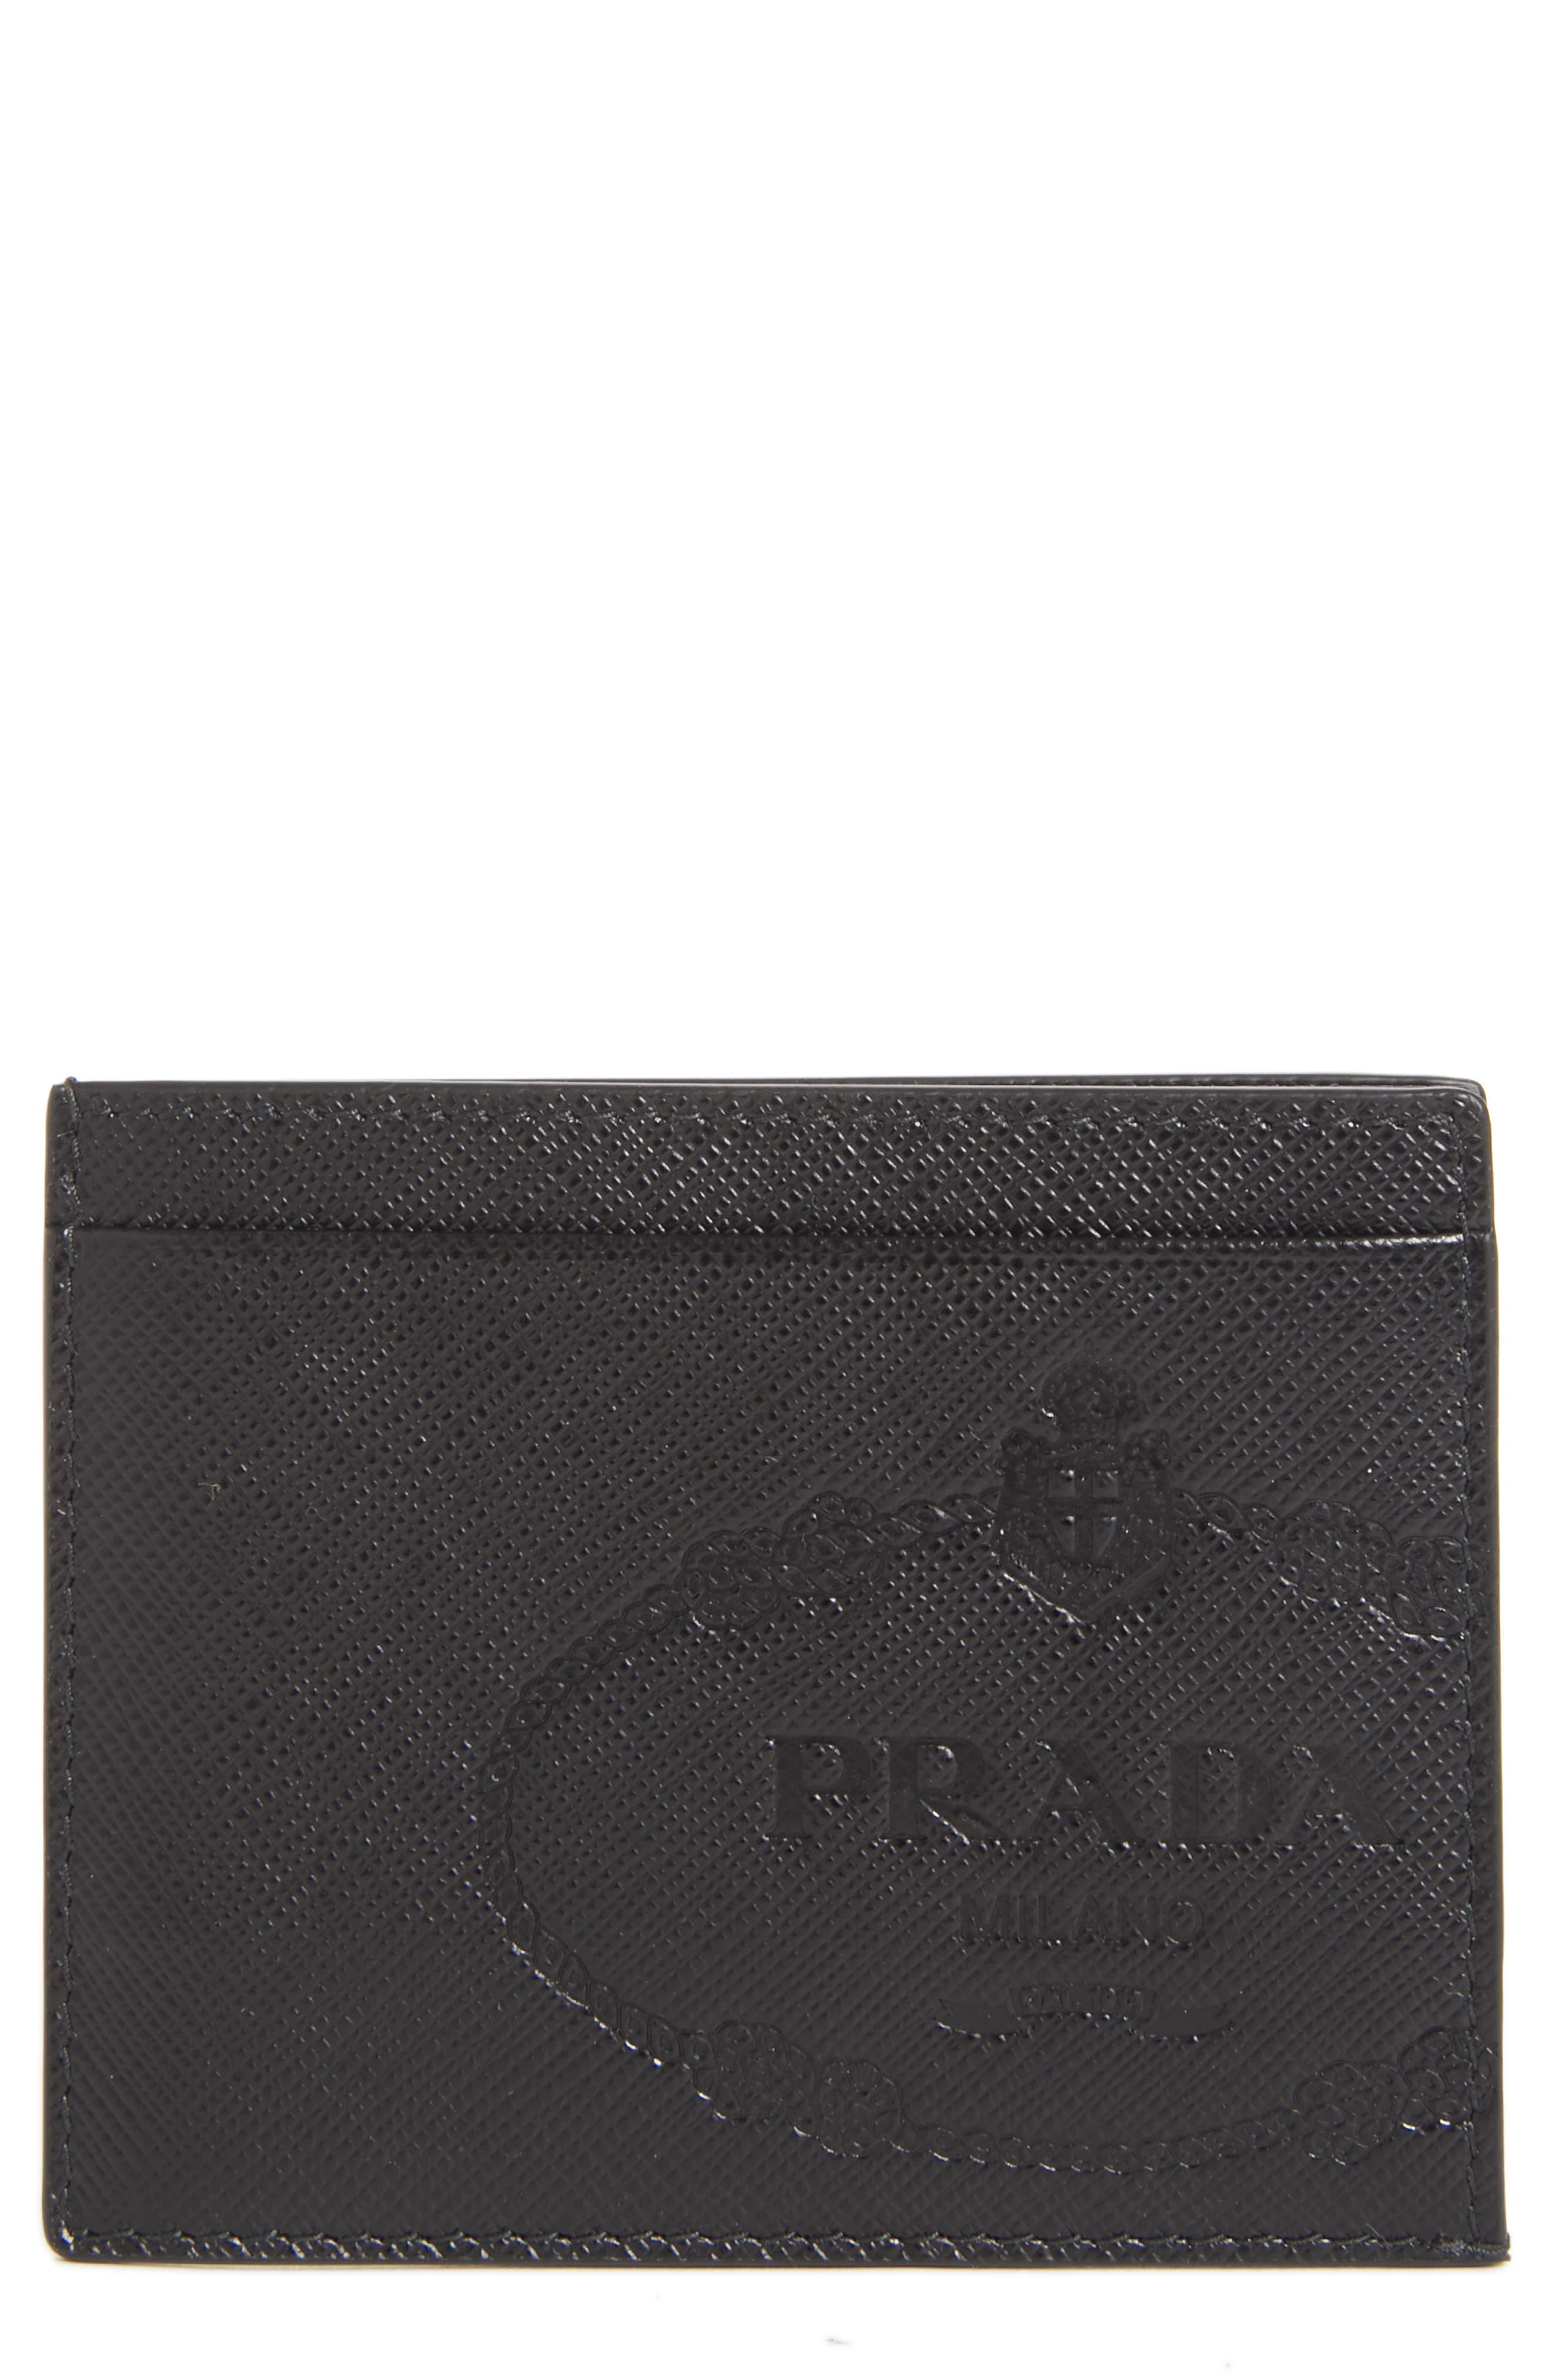 Logo Saffiano Leather Card Case,                             Main thumbnail 1, color,                             BLACK